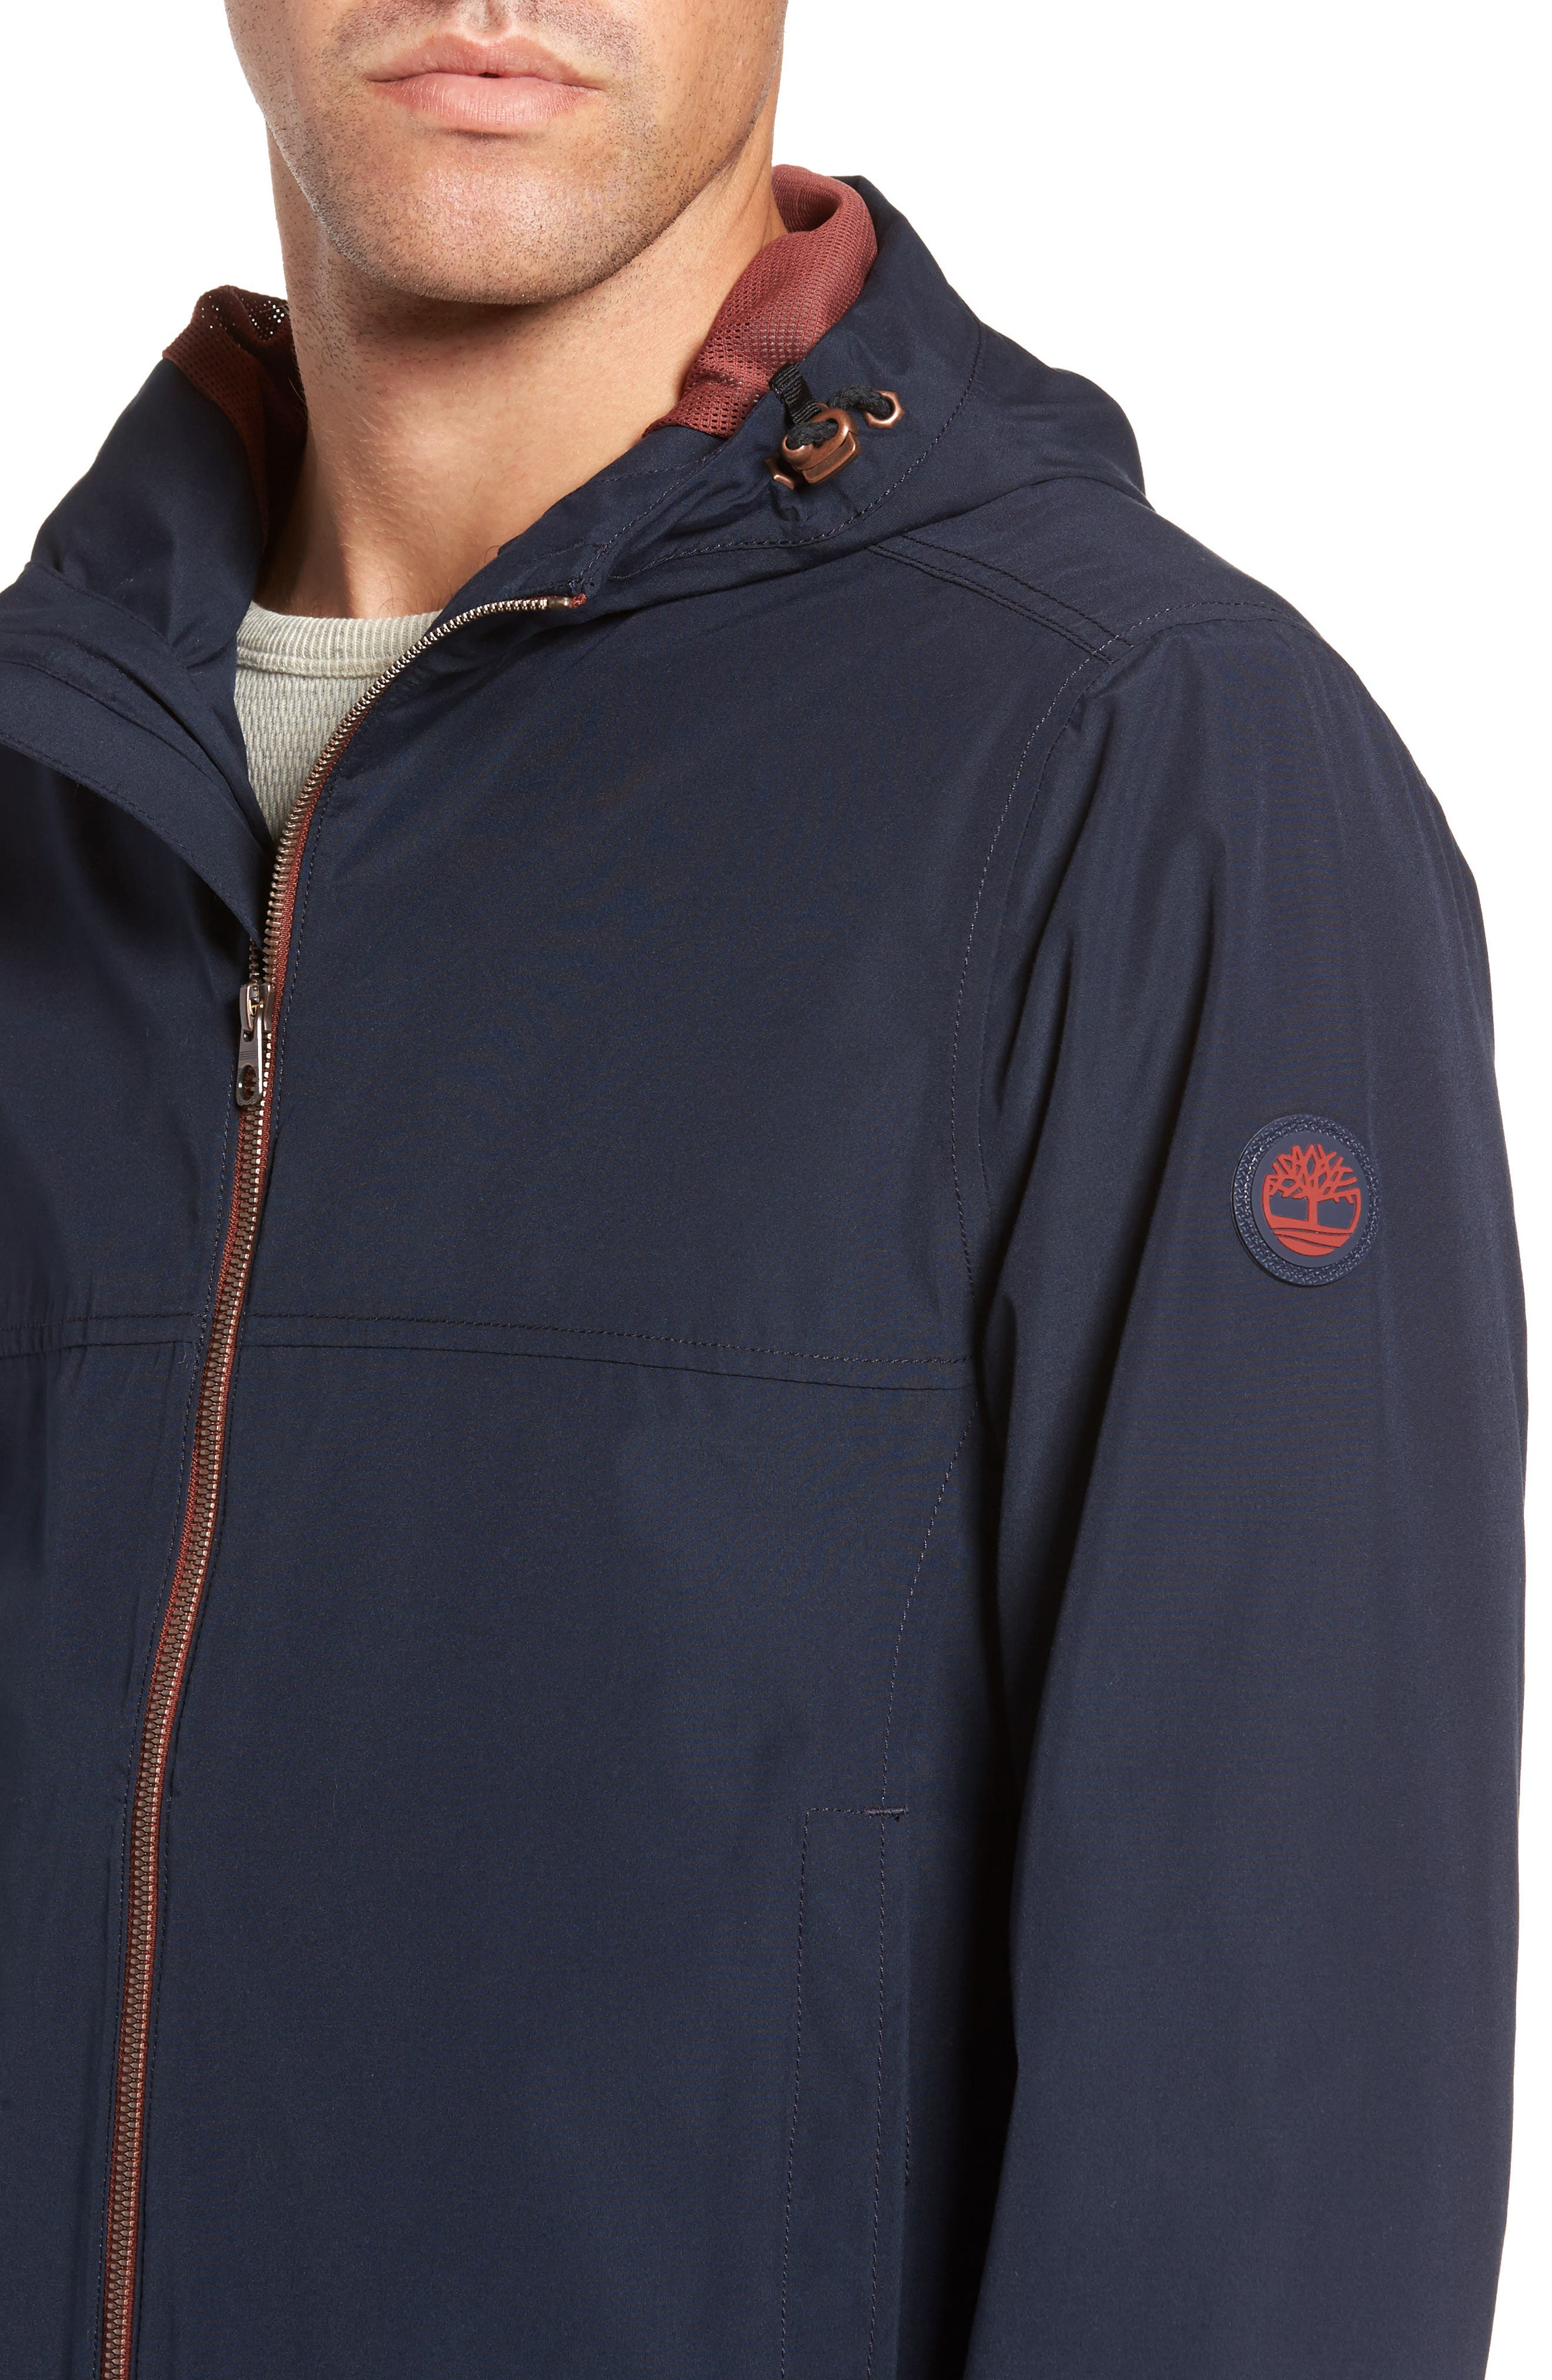 Ragged Mountain Packable Waterproof Jacket,                             Alternate thumbnail 8, color,